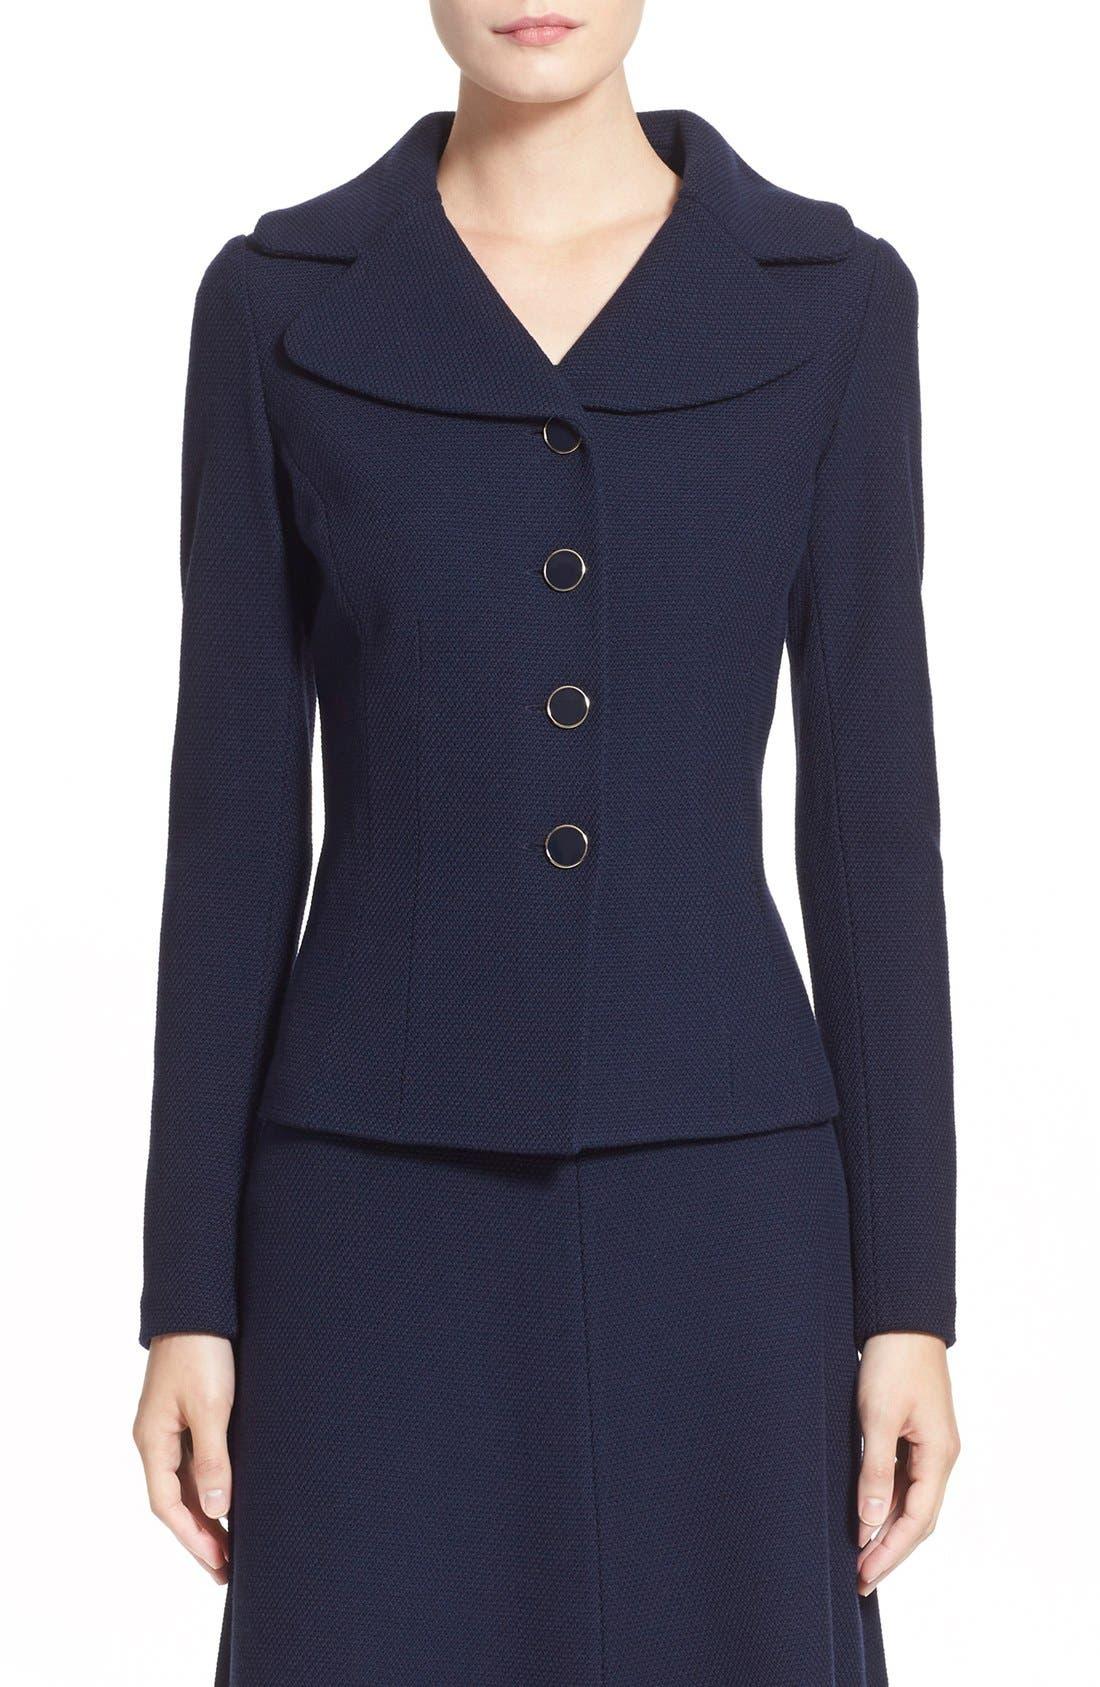 ST. JOHN COLLECTION Micro Bouclé Knit Jacket, Main, color, NAVY